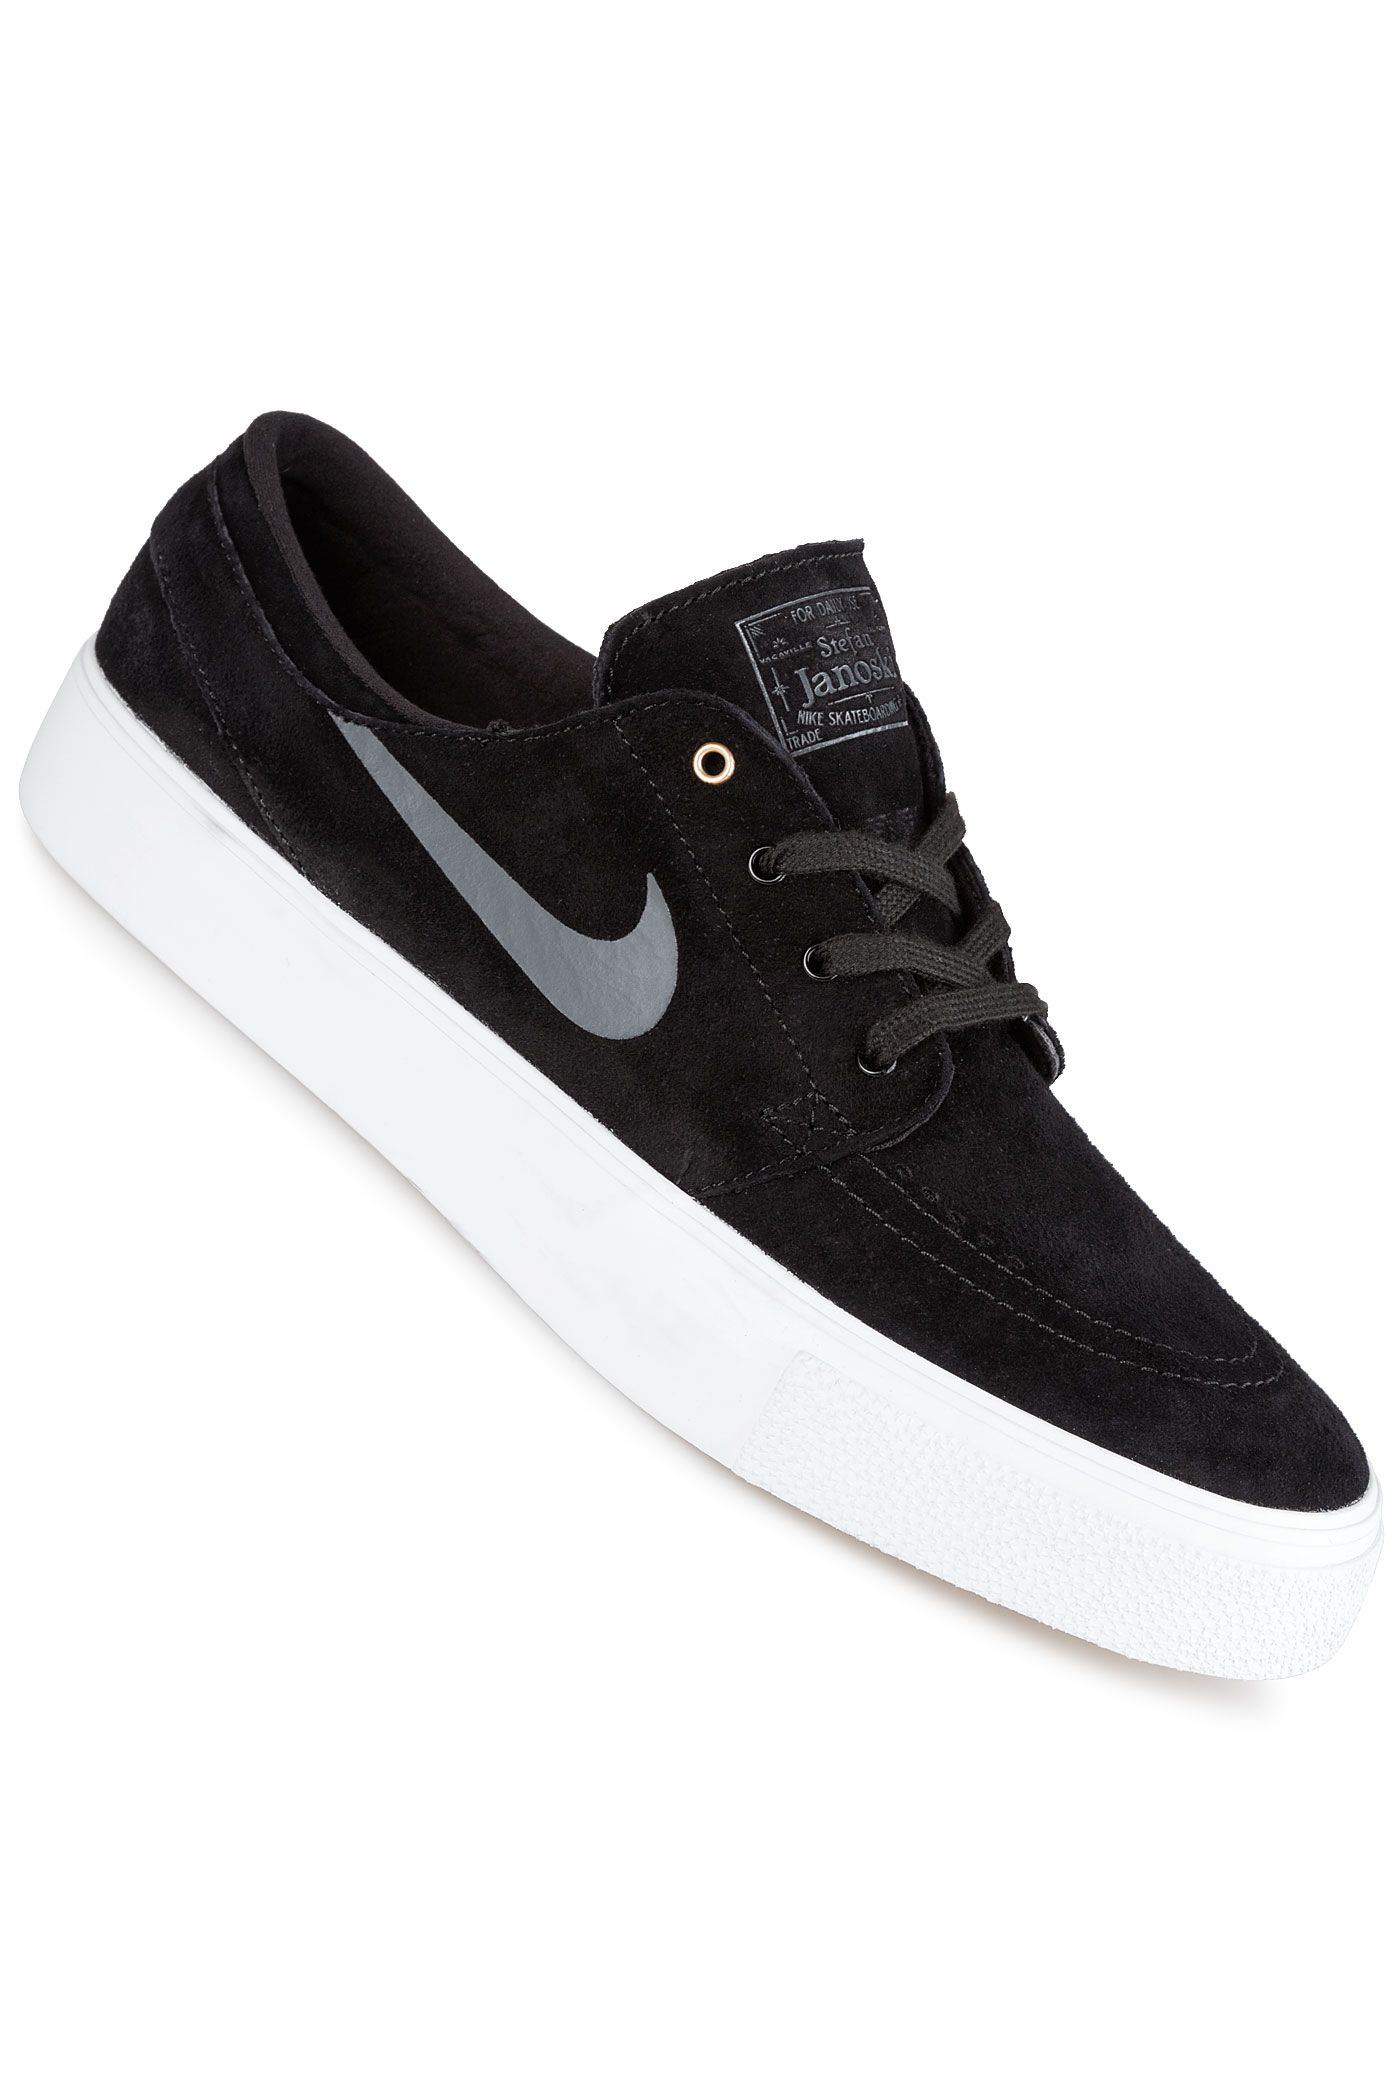 Nike SB Zoom Stefan Janoski Premium HT Schuh (black dark grey)